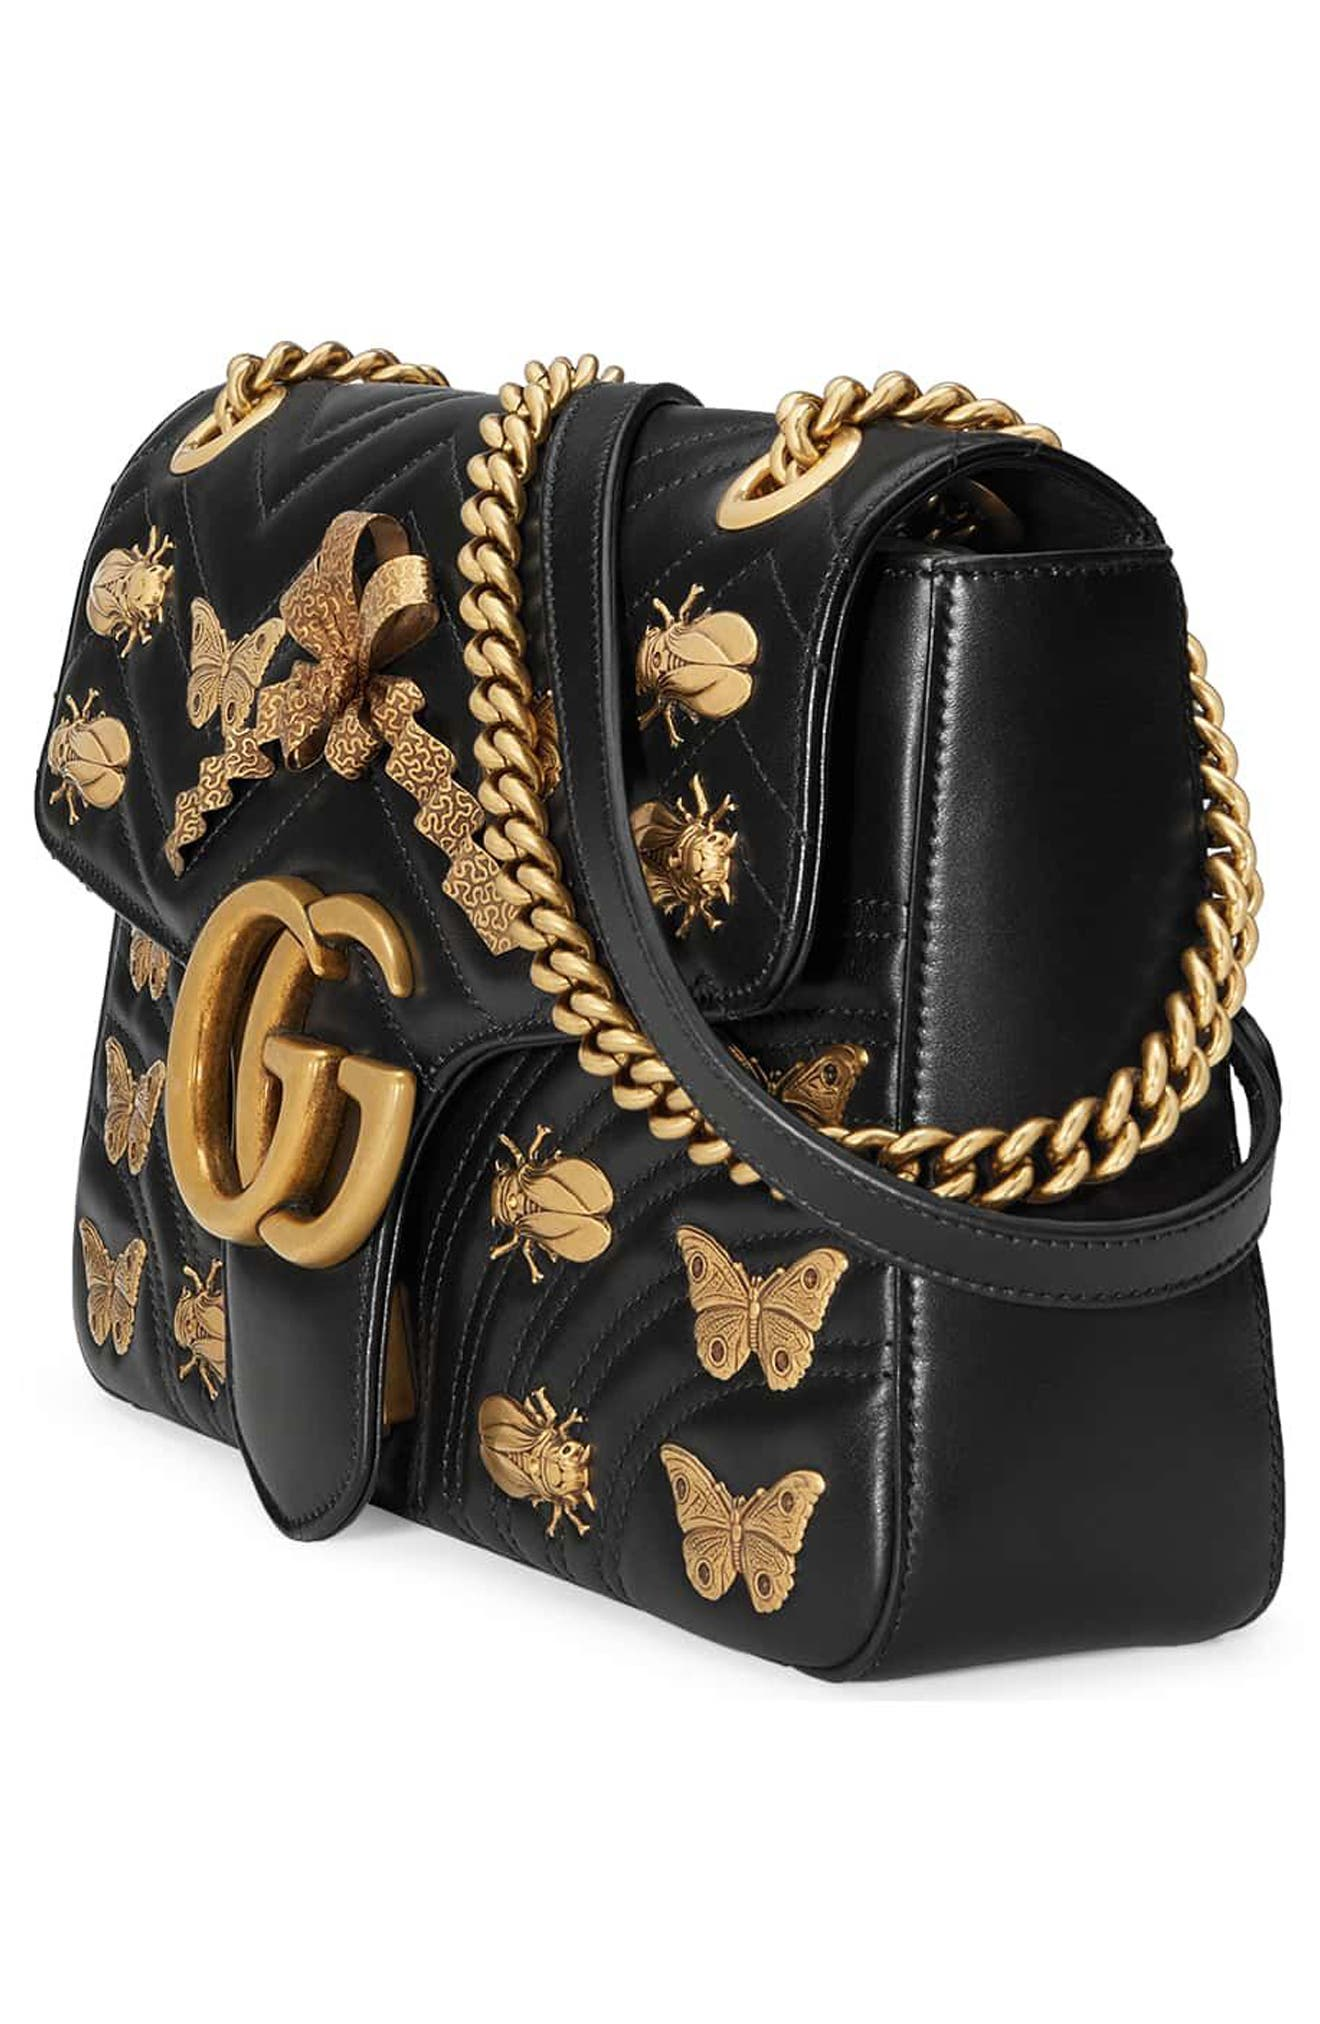 Medium GG Marmont 2.0 Animal Stud Matelassé Leather Shoulder Bag,                             Alternate thumbnail 4, color,                             001